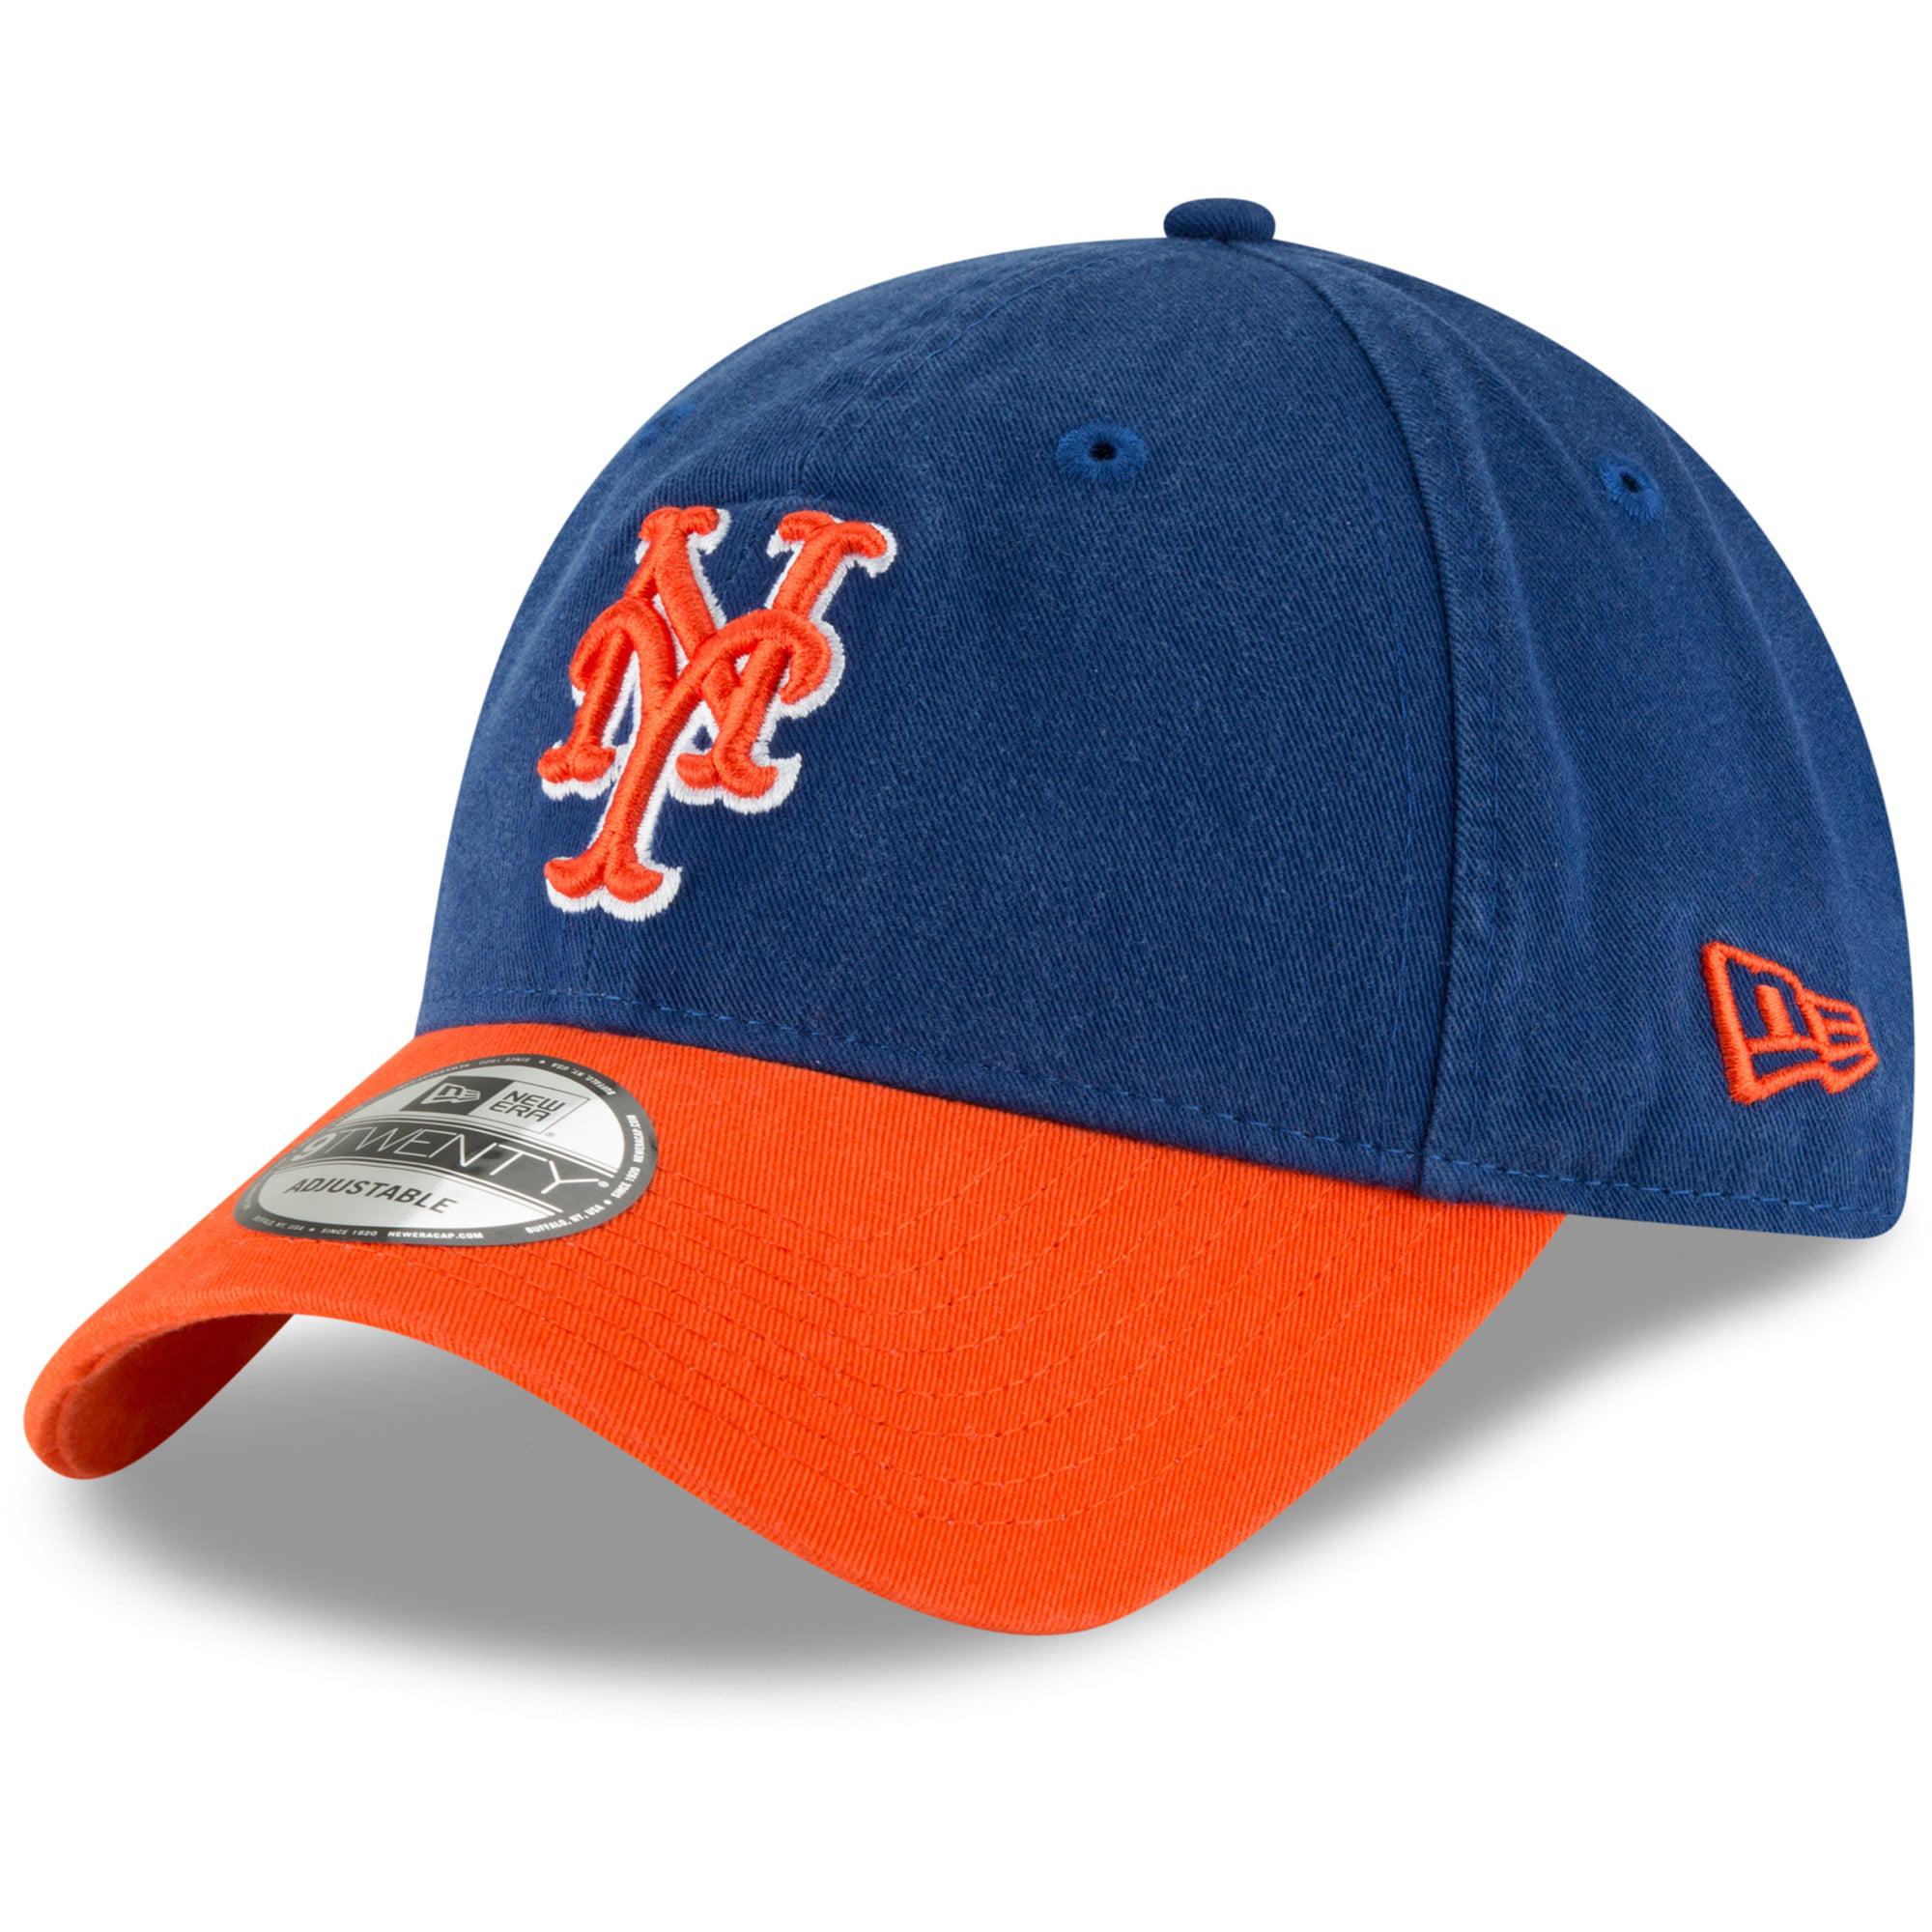 New York Mets New Era Core Classic Secondary 9TWENTY Adjustable Hat - Royal/Orange - OSFA